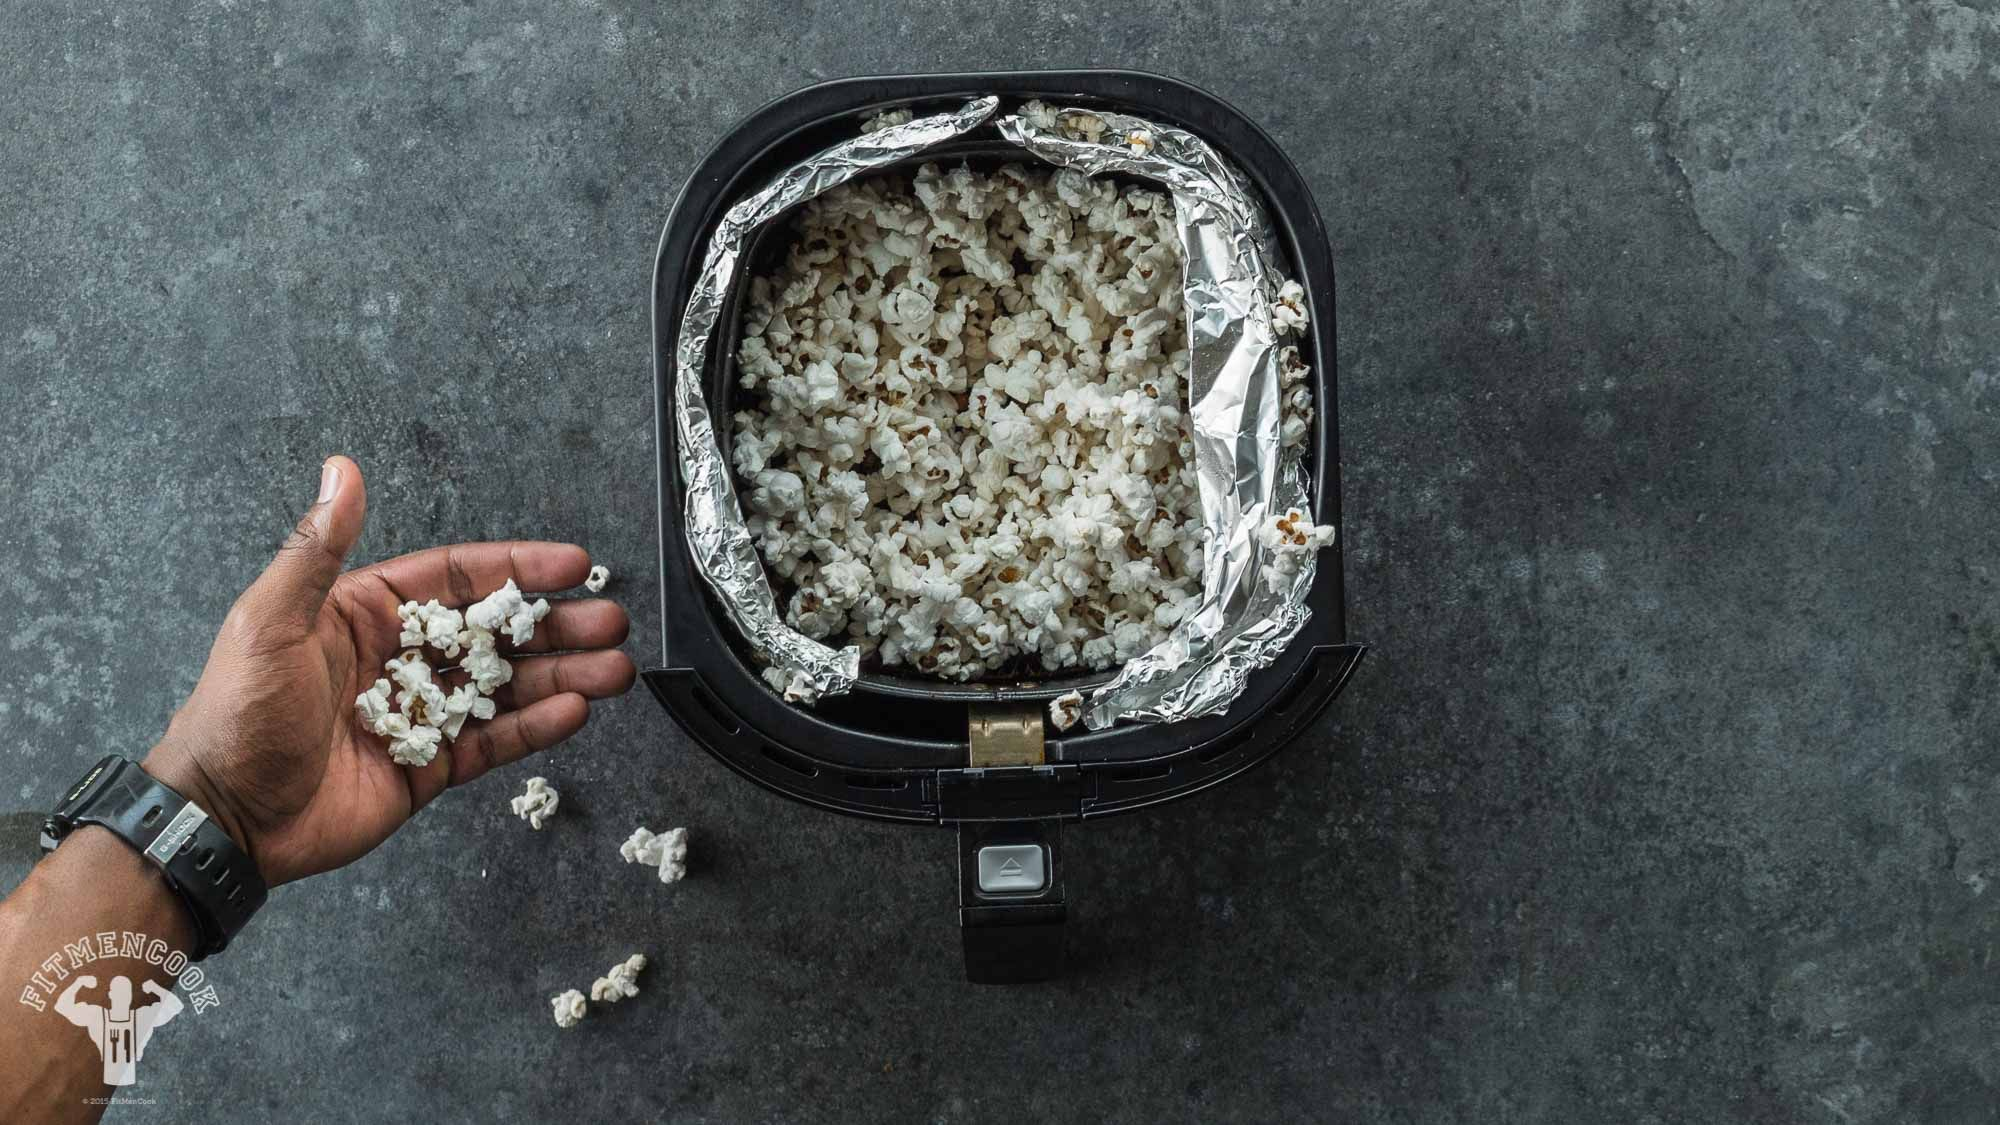 air fried popcorn Air fryer healthy, Air fryer recipes